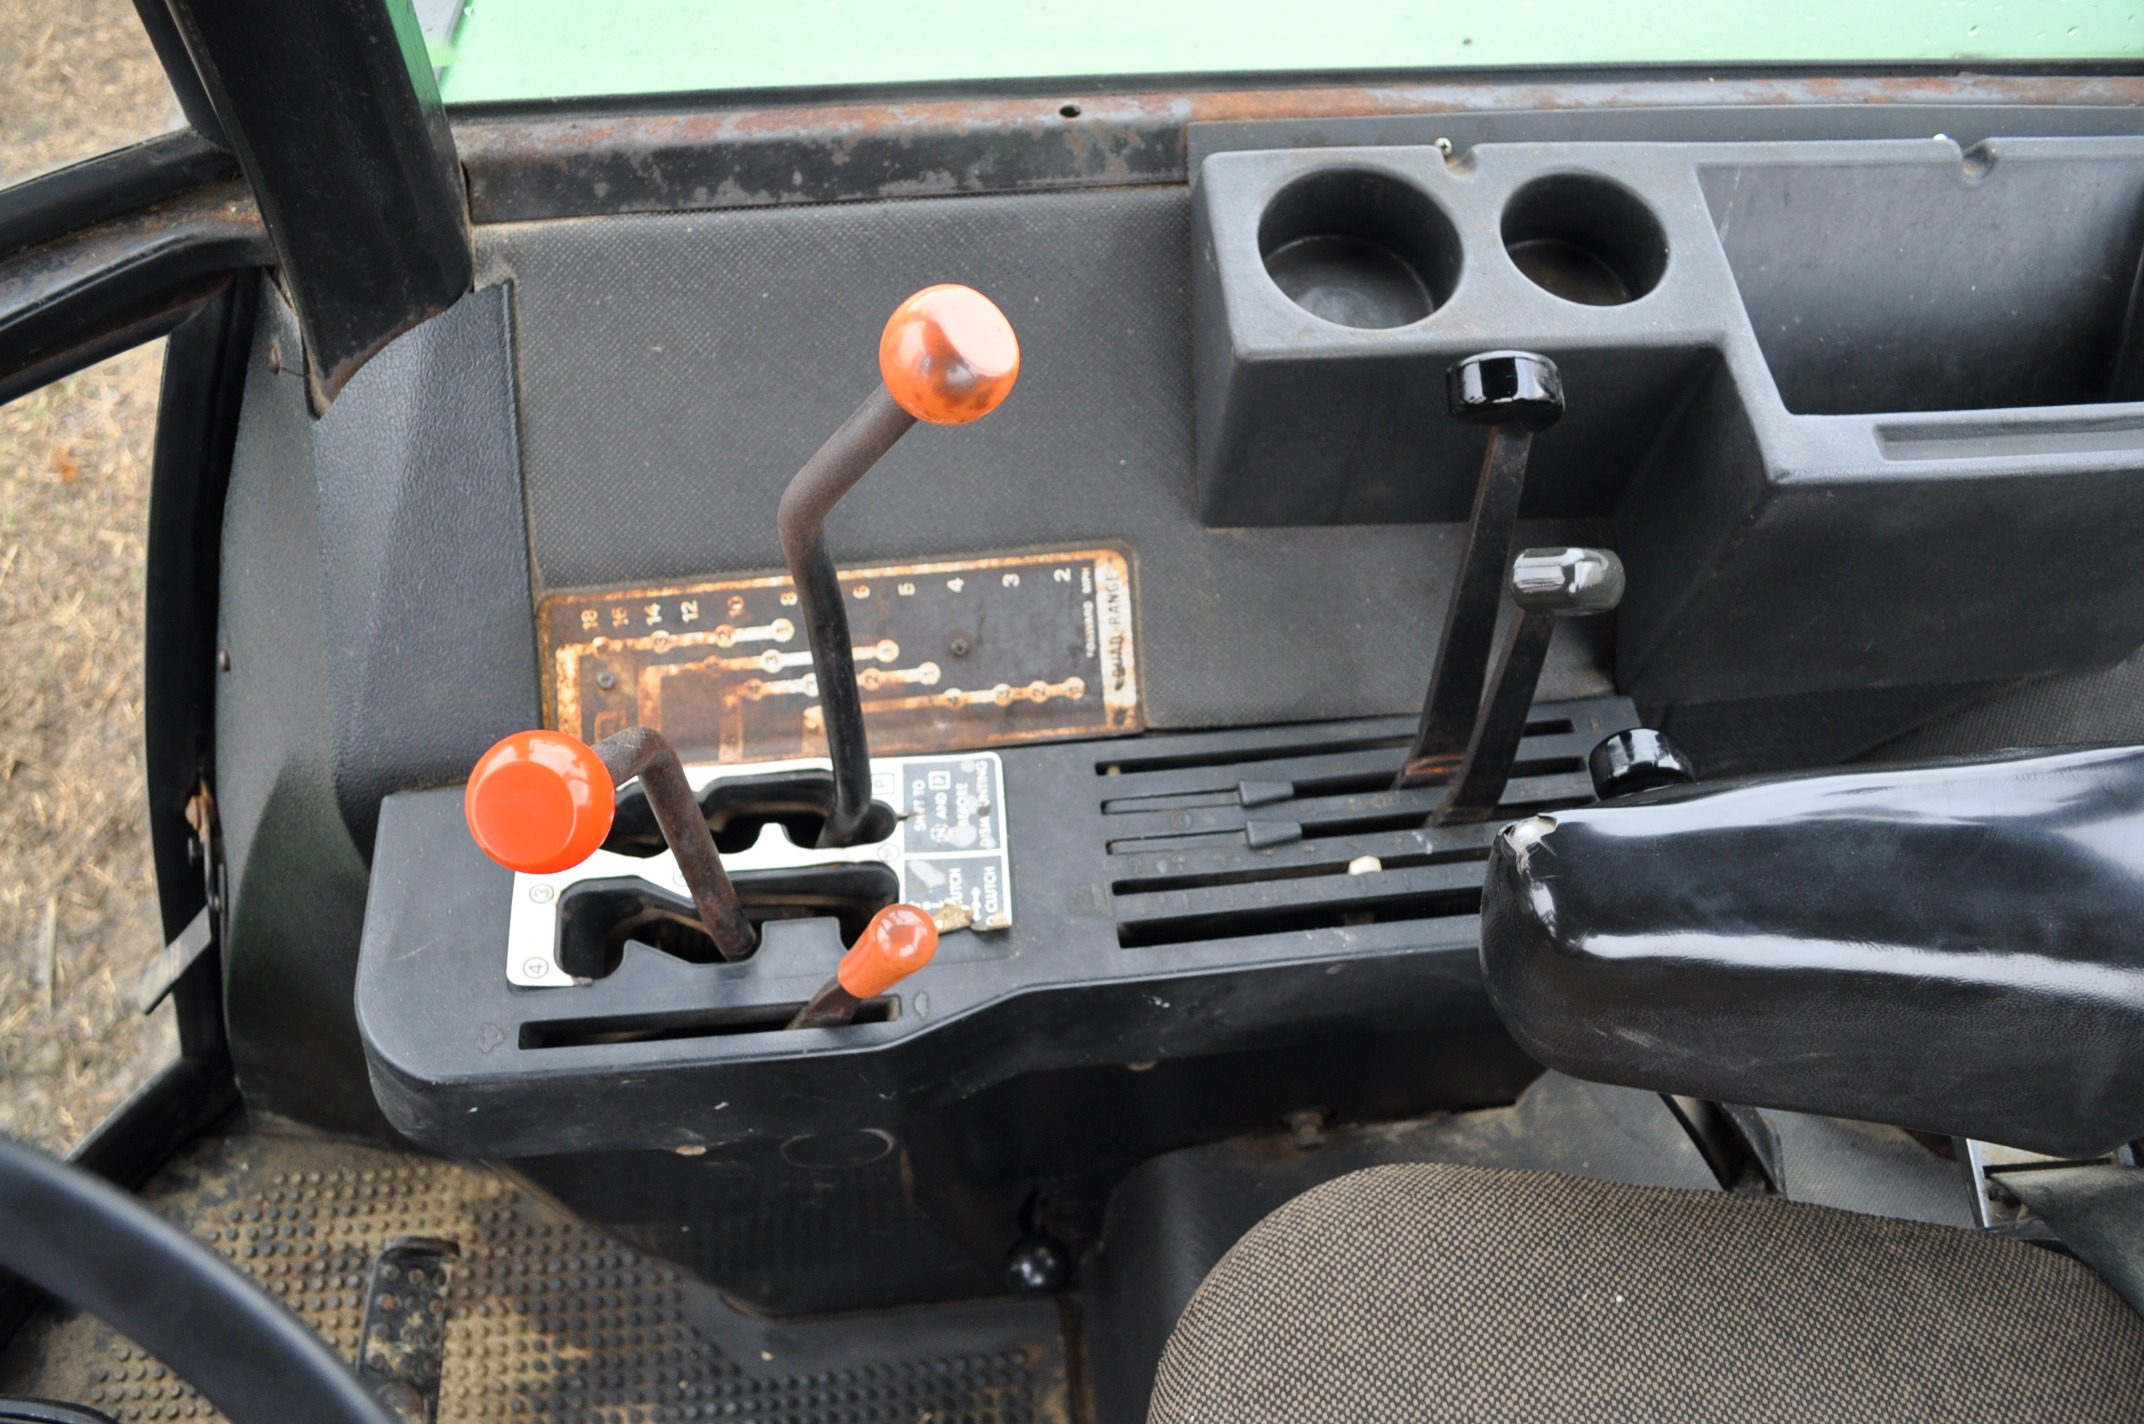 John Deere 4630 tractor, diesel, 20.8-38 hub duals, 14L-16 front, CHA, Quad range, 2 hyd remotes, - Image 18 of 22